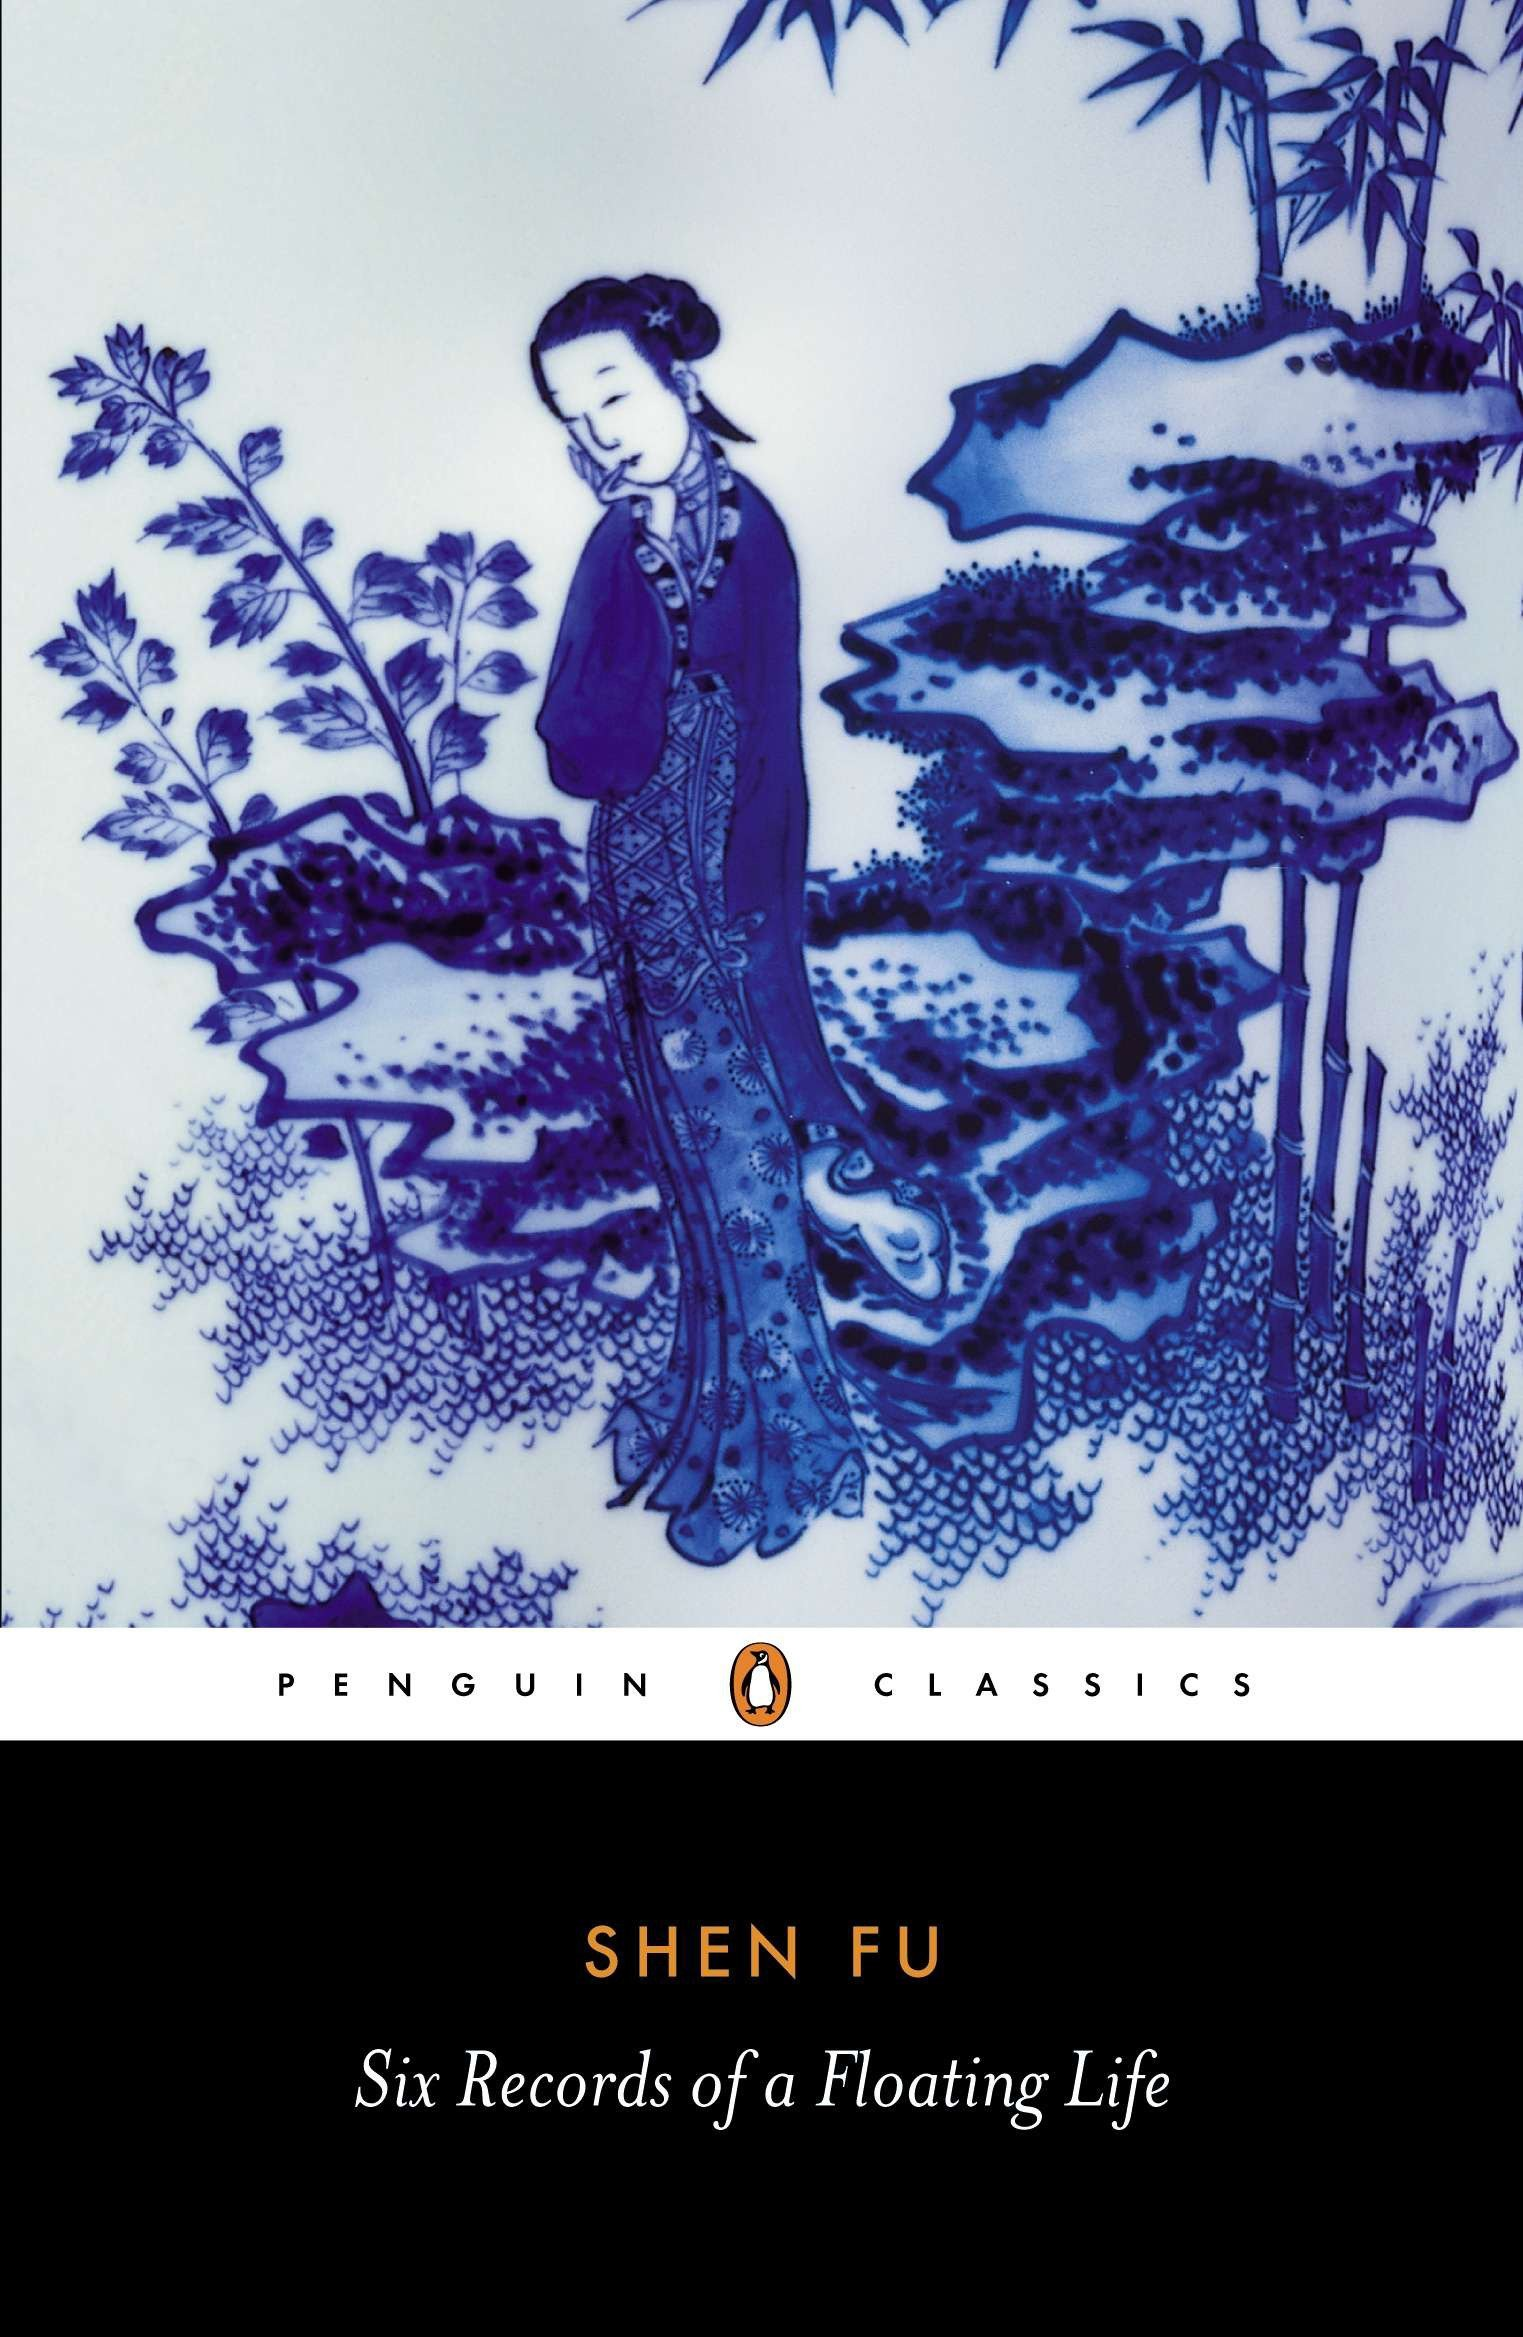 Six Records of a Floating Life (Penguin Classics) Paperback – November 17,  1983